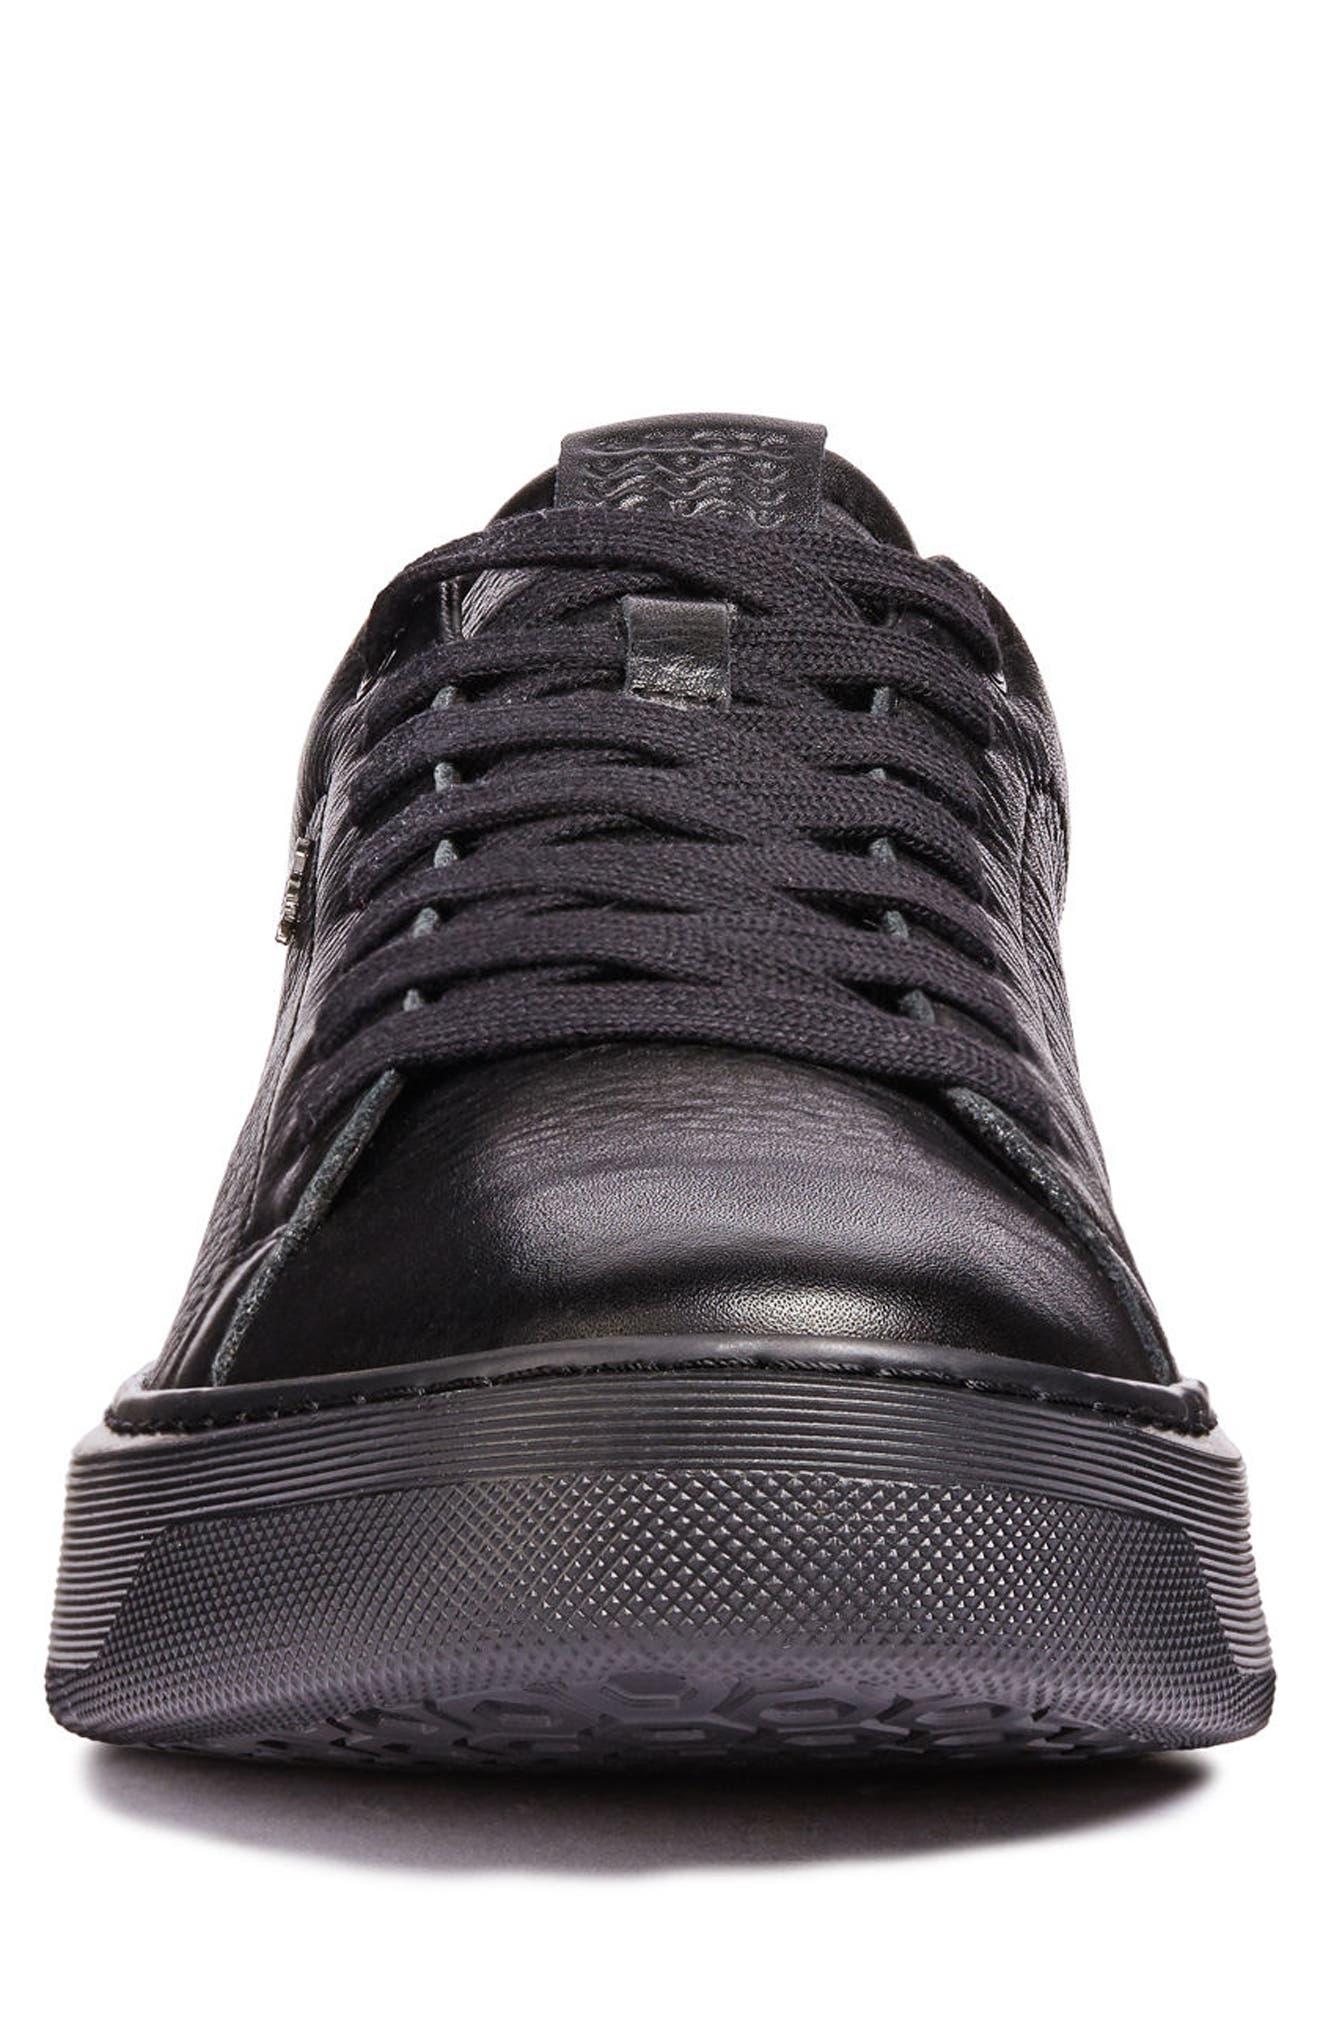 Deiven 4 Low Top Sneaker,                             Alternate thumbnail 4, color,                             BLACK LEATHER